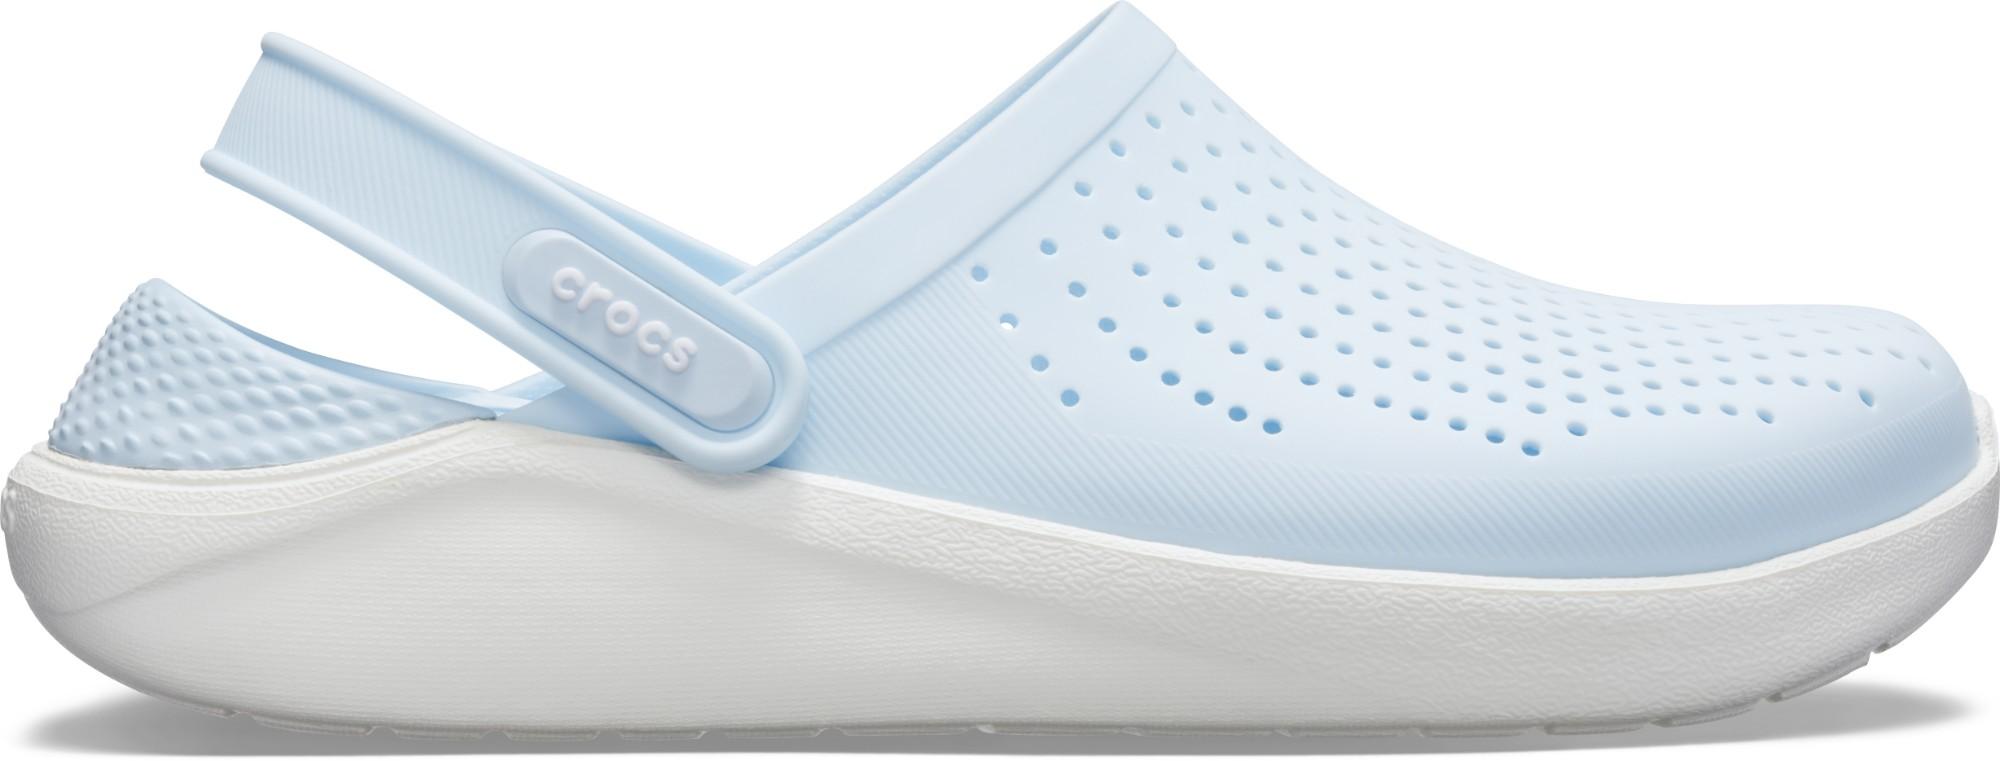 Crocs™ LiteRide Clog Mineral Blue/White 37,5